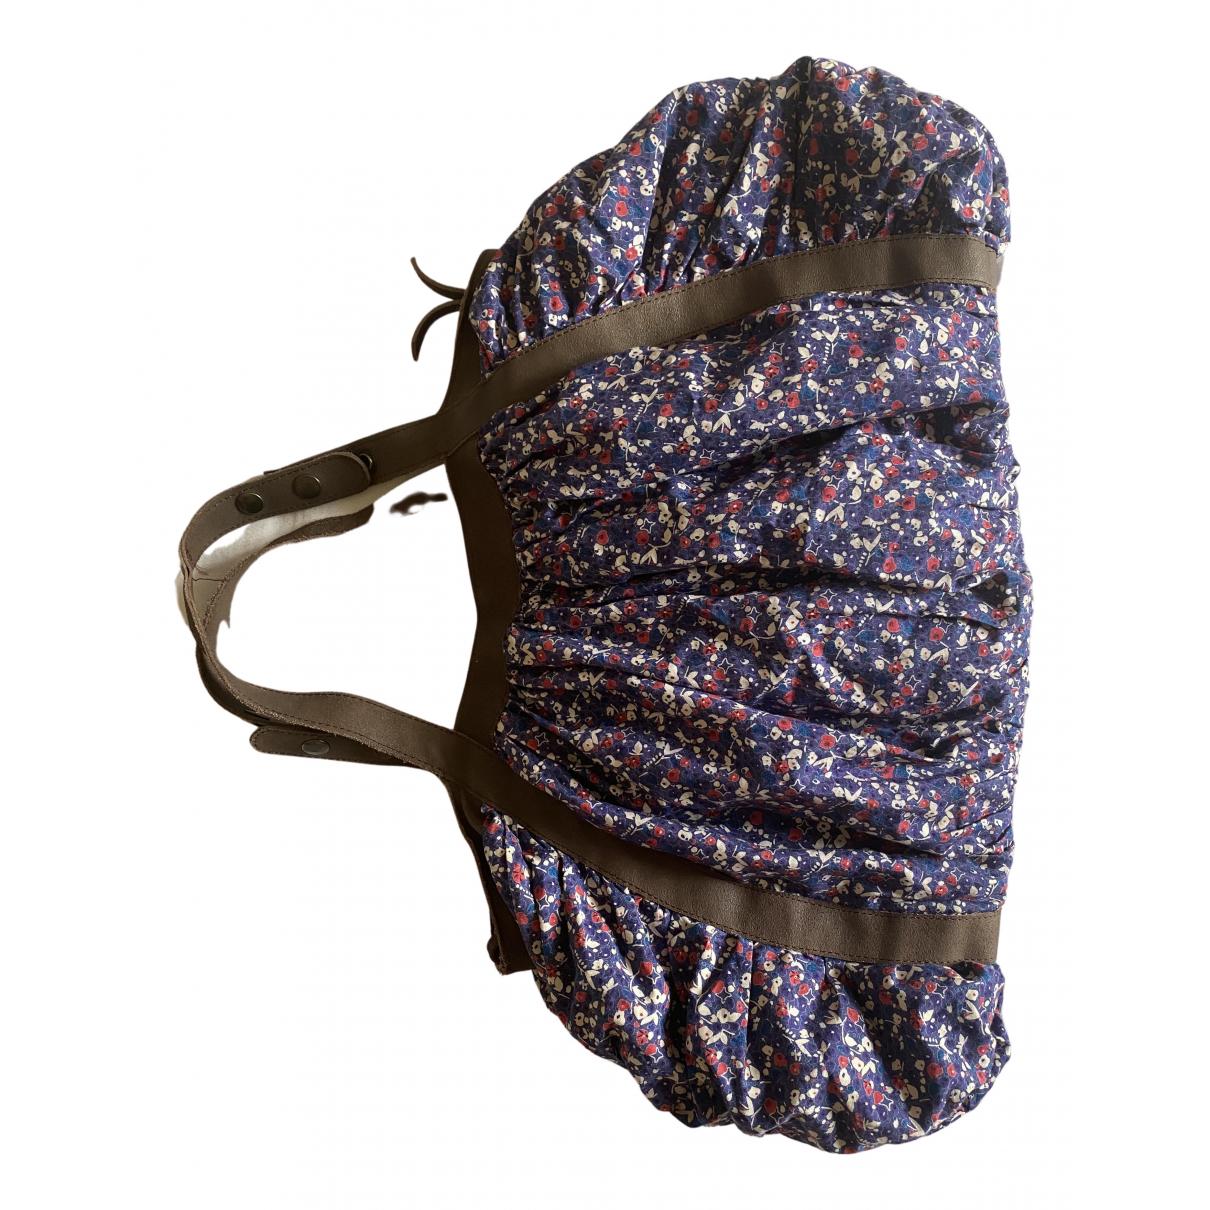 Sessun \N Handtasche in  Bunt Baumwolle